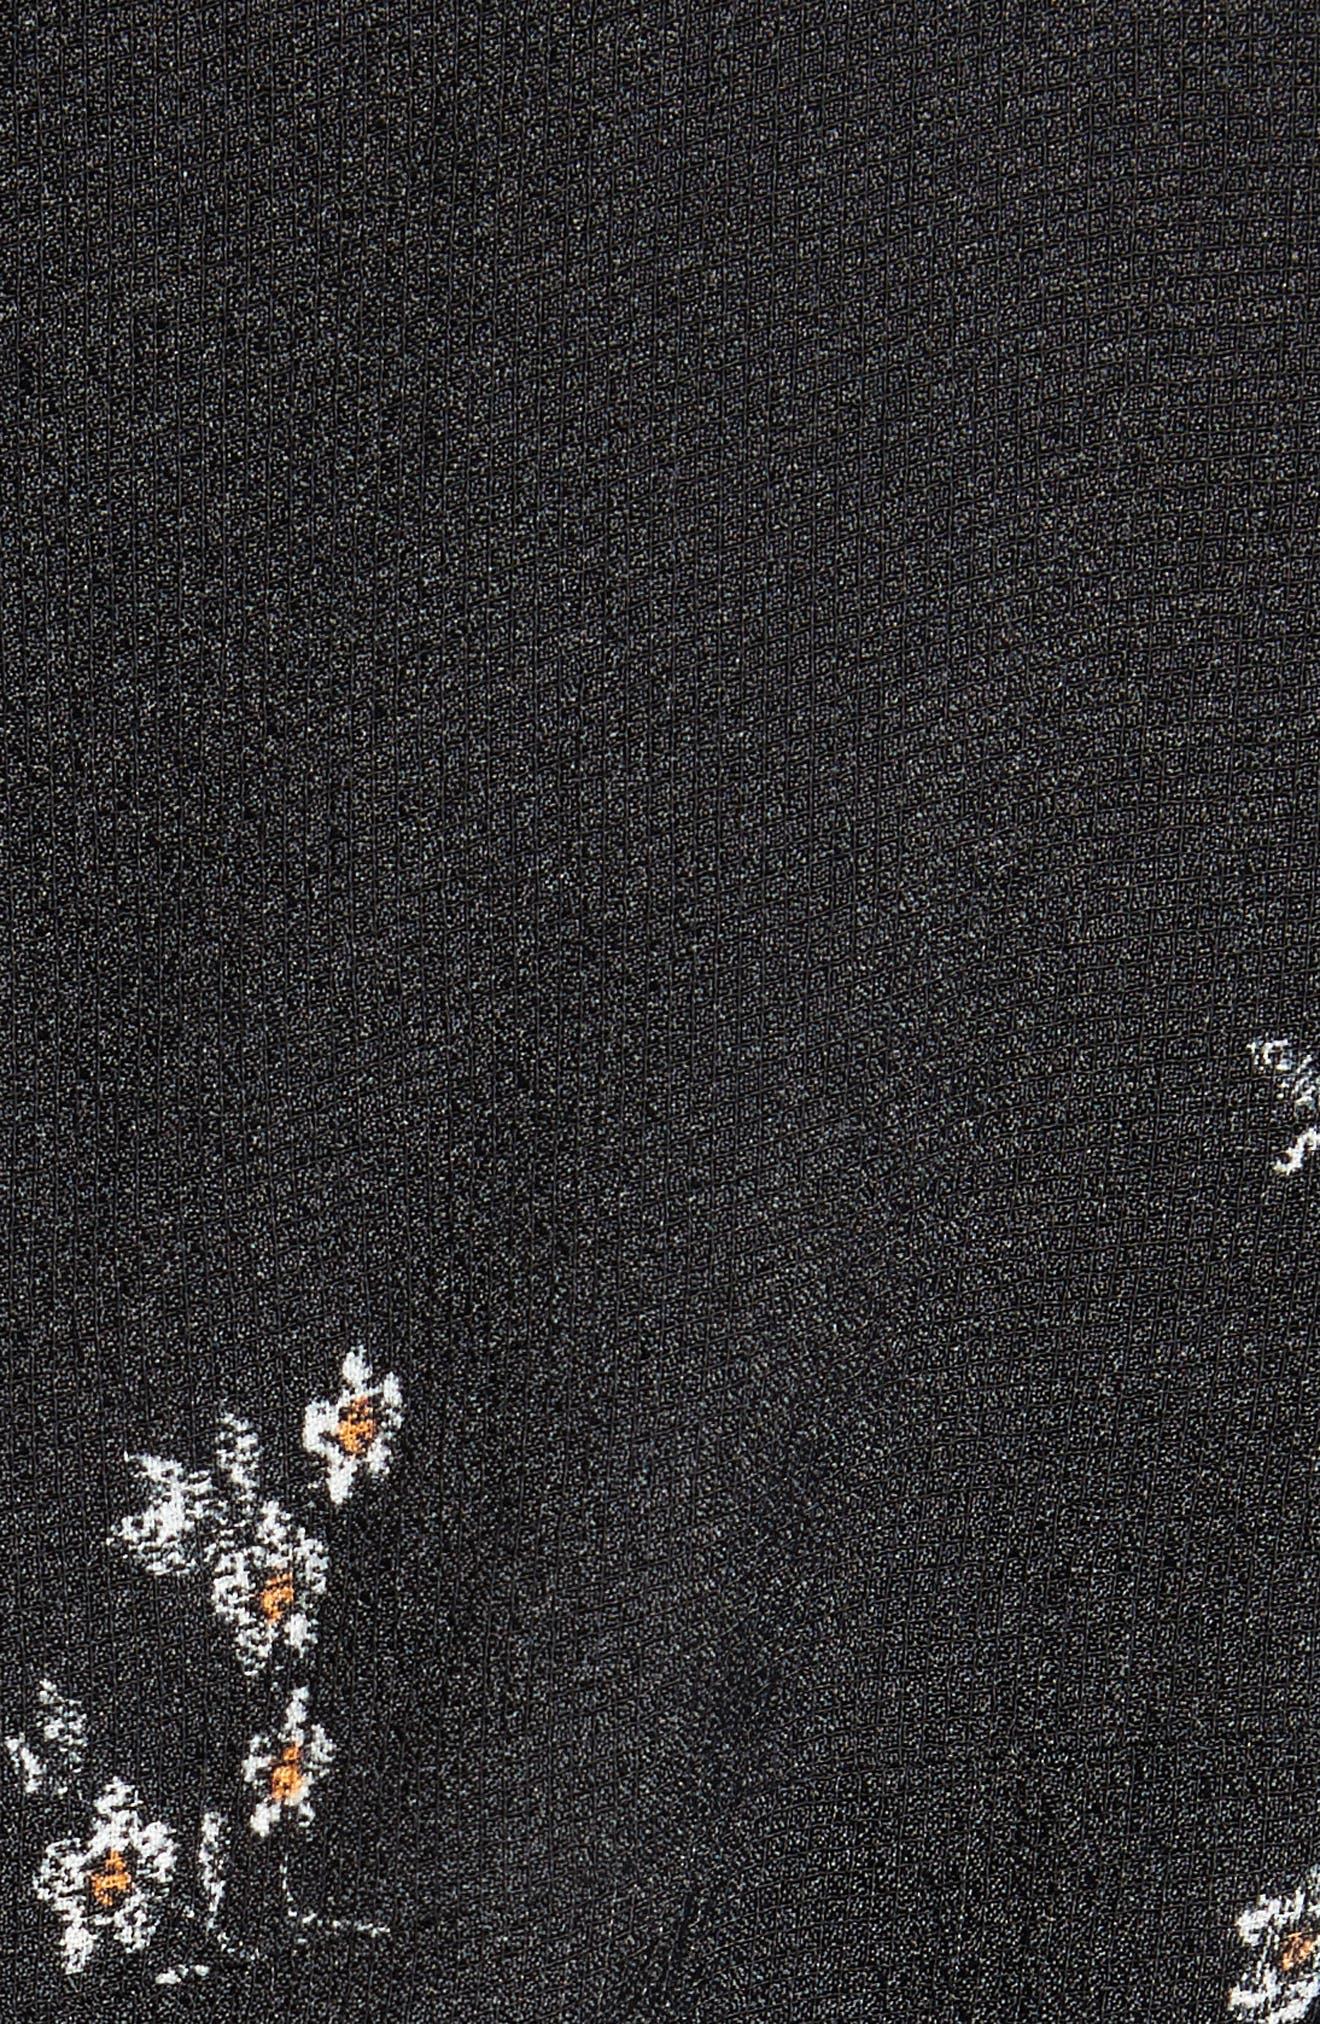 Florence Lili Floral Top,                             Alternate thumbnail 5, color,                             Black Multi